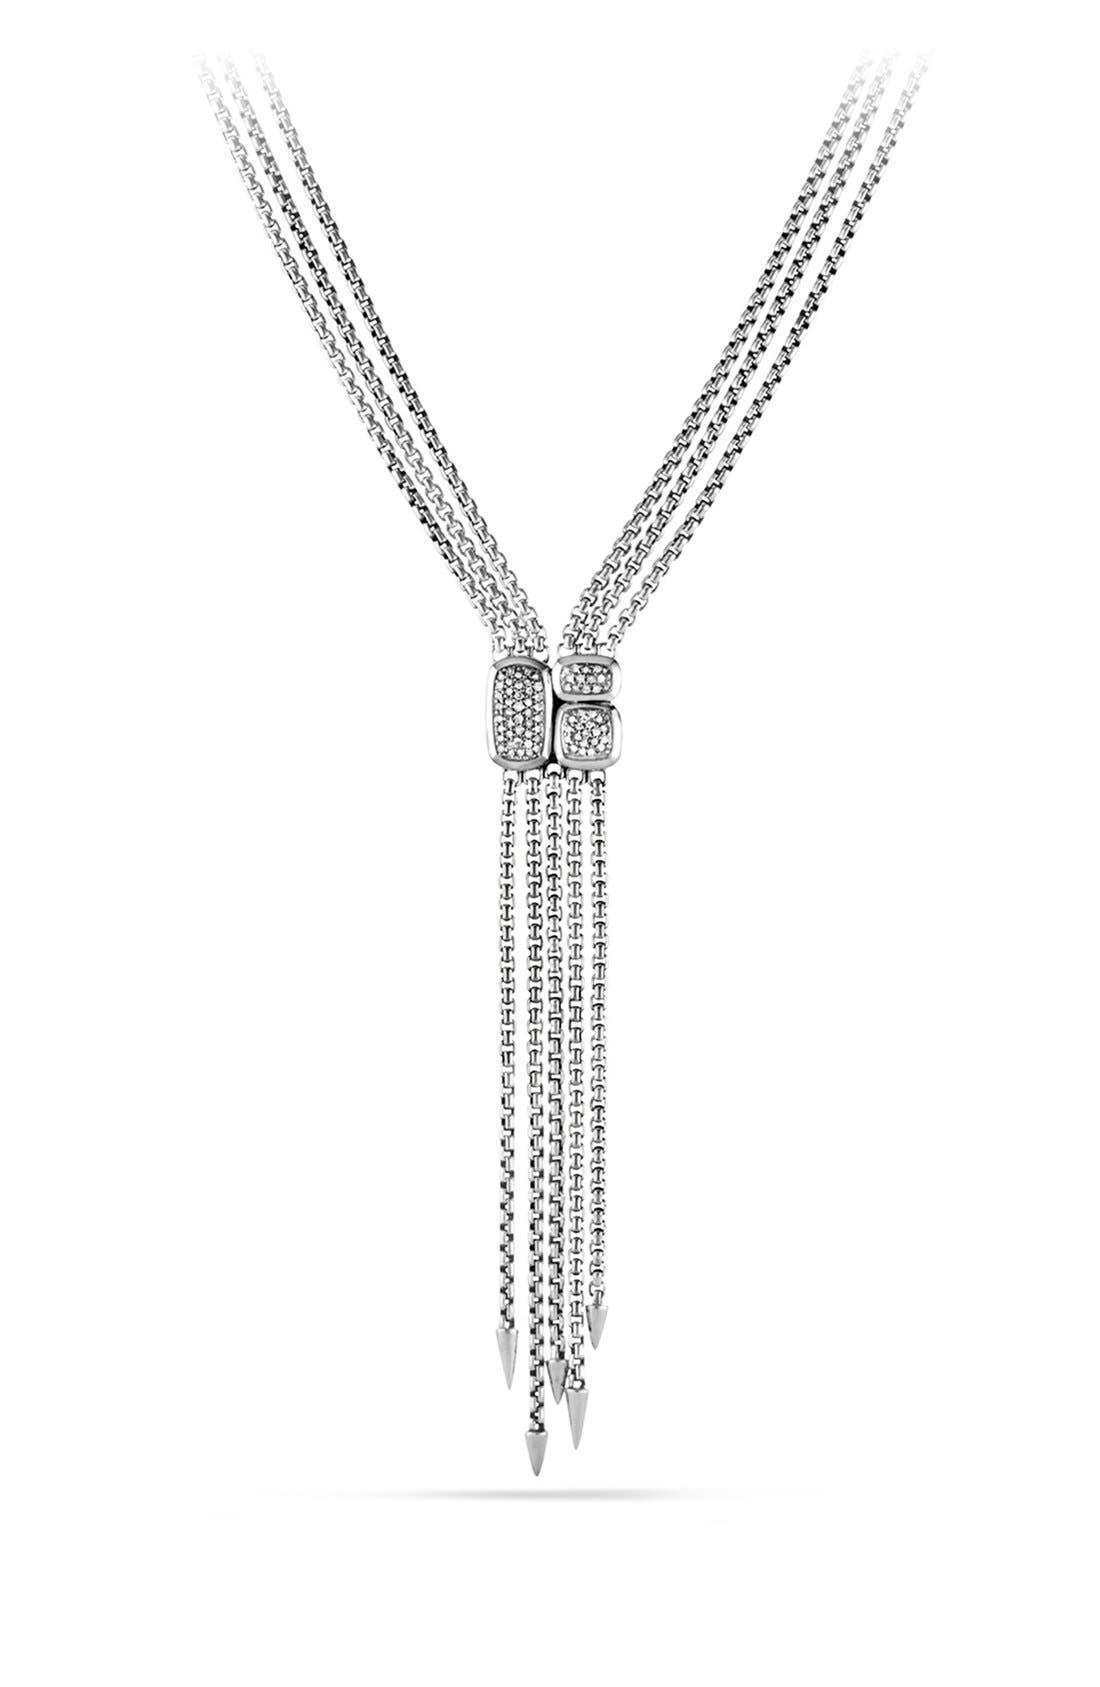 DAVID YURMAN Confetti Drop Necklace with Diamonds